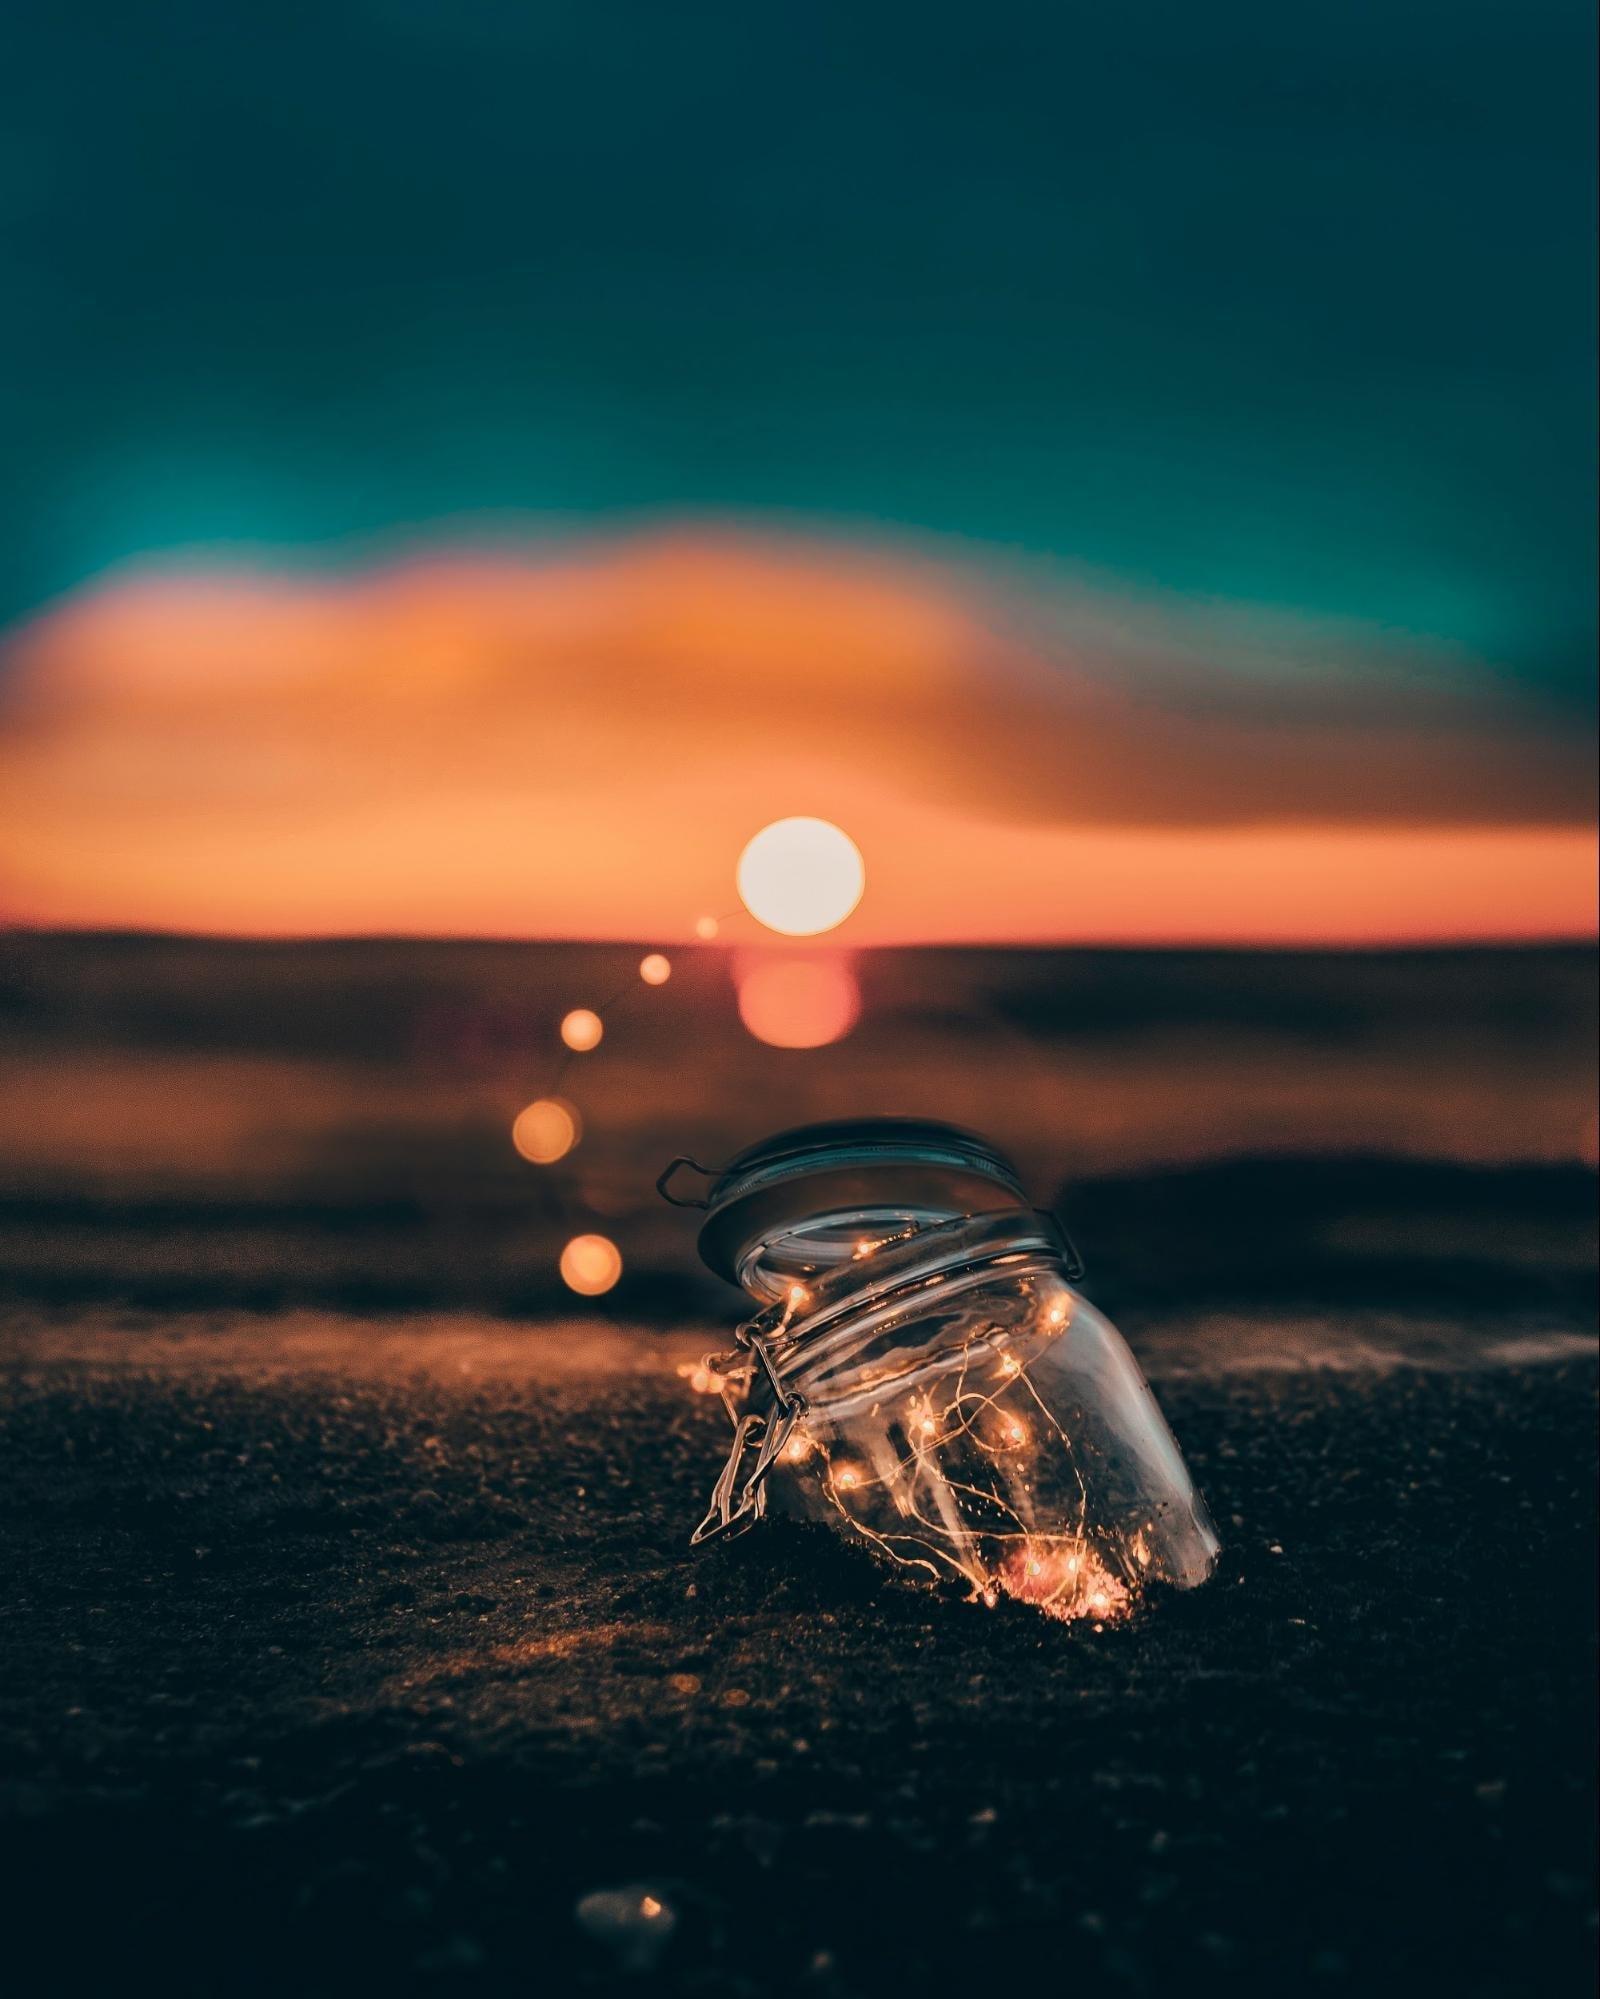 Jar with fairylights bokeh effect